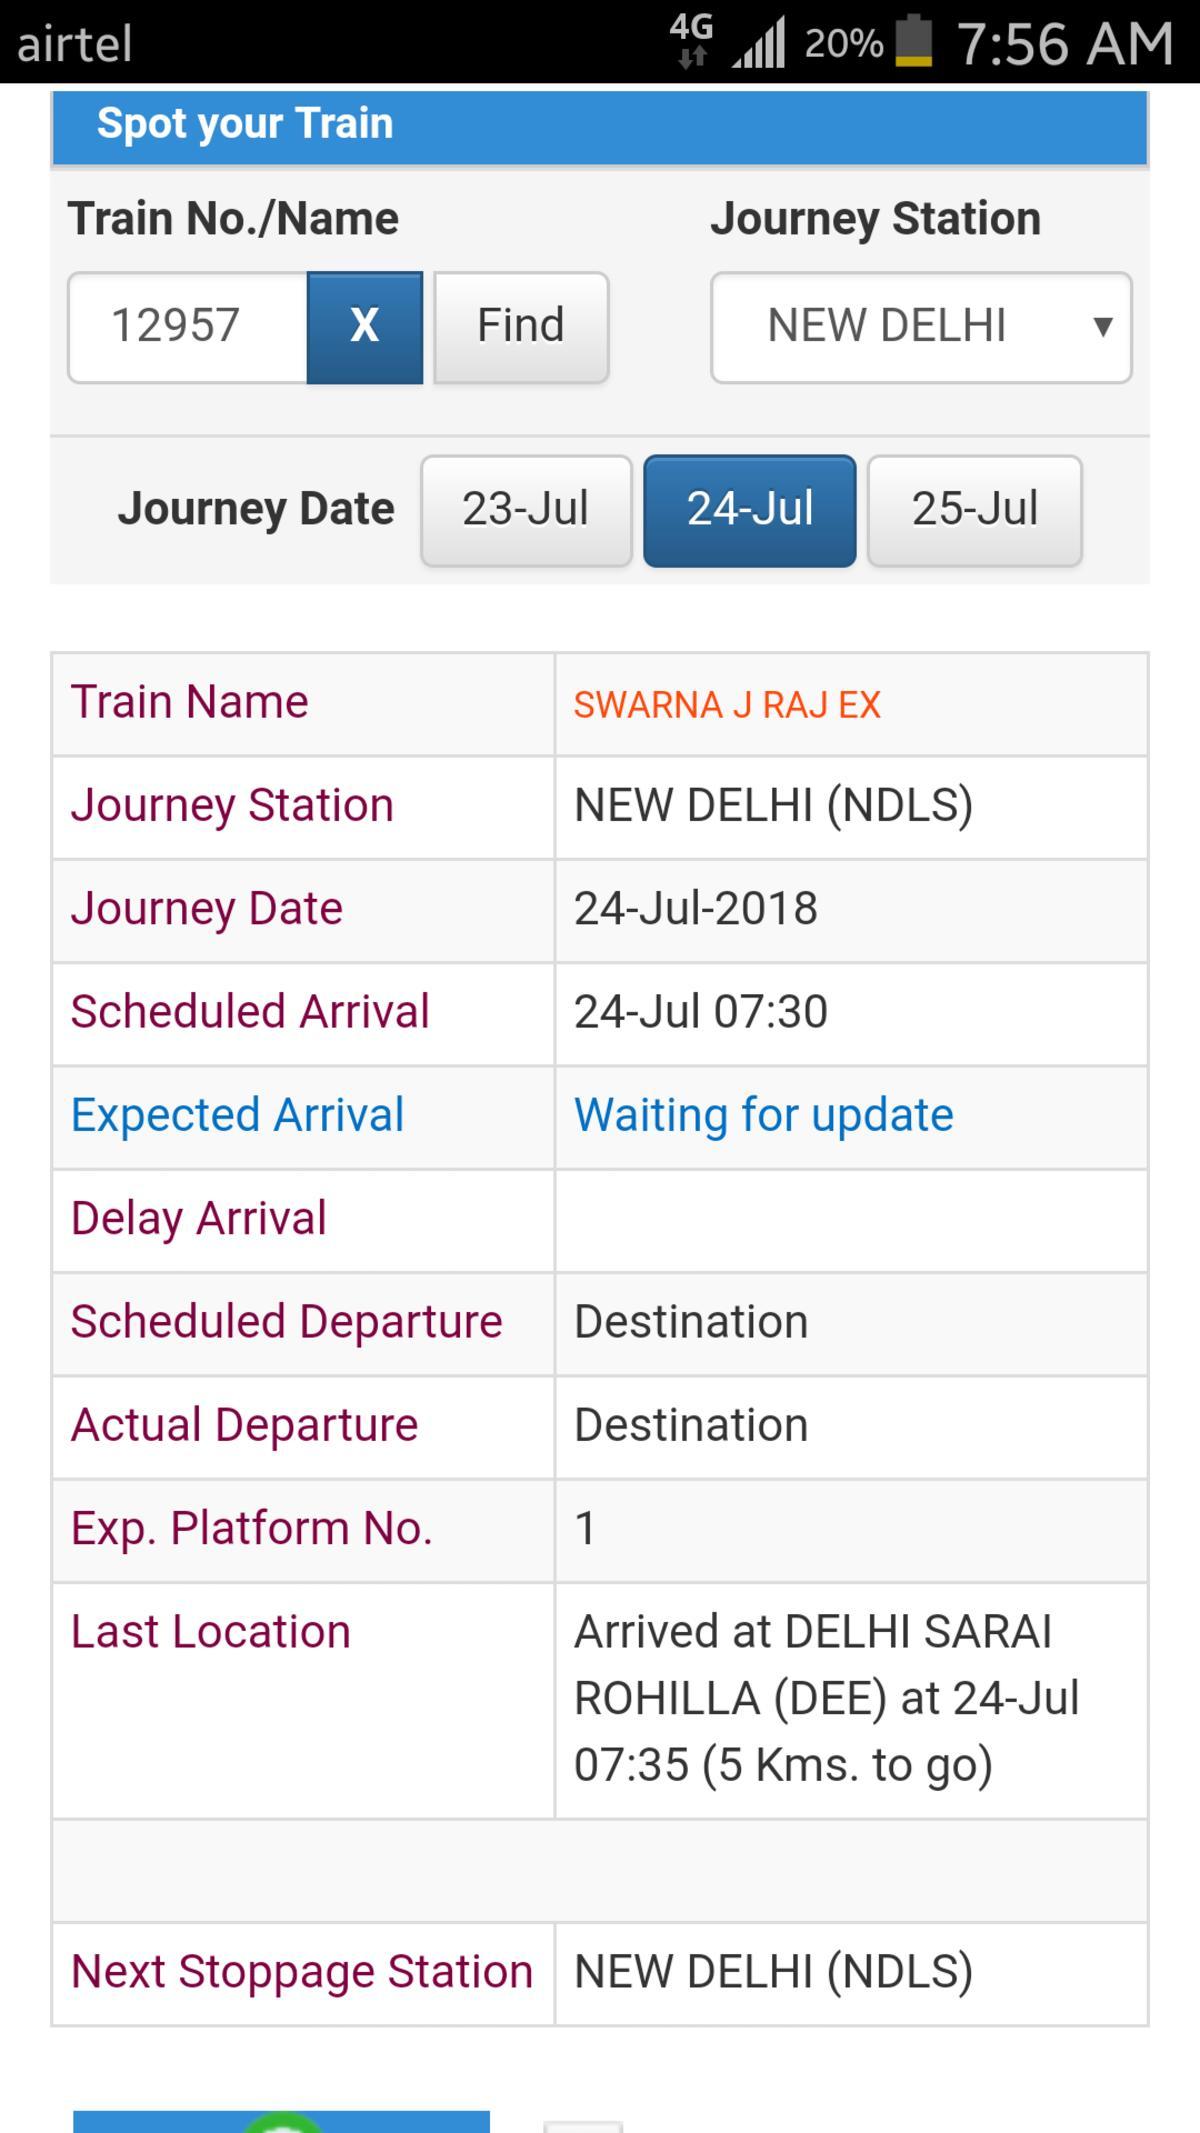 Swarna Jayanti Rajdhani Express/12957 Picture & Video Gallery